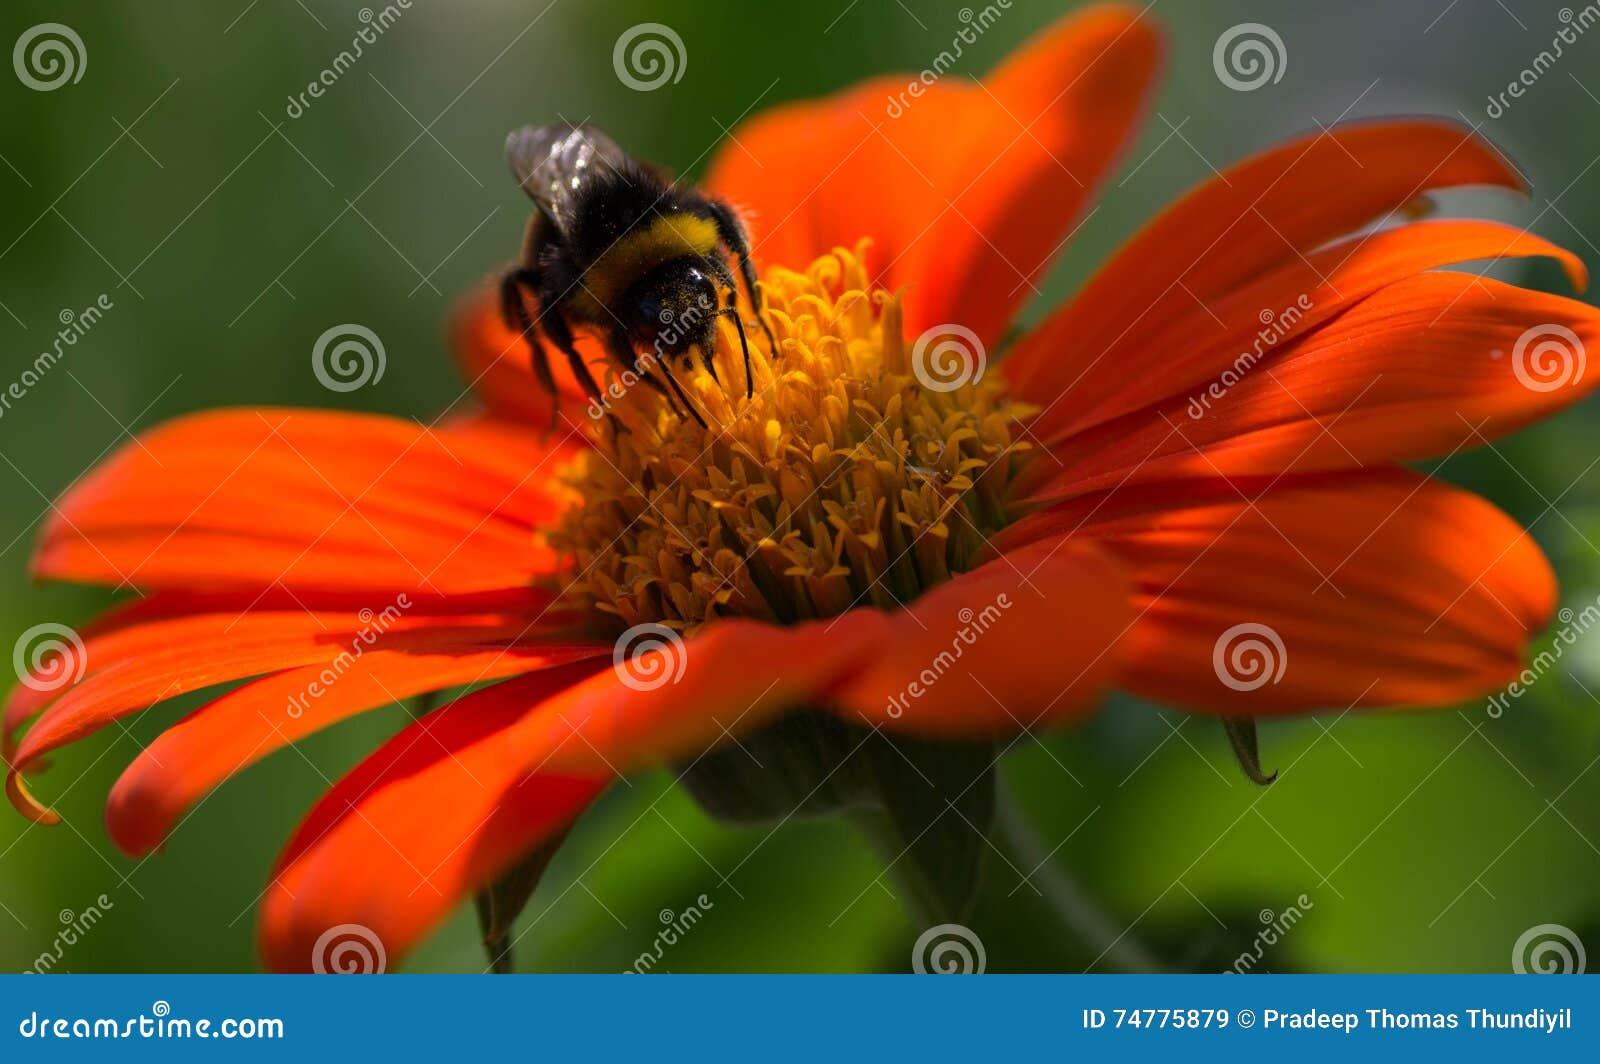 orange springs online dating Meet single women in orange springs fl online & chat in the forums dhu is a 100% free dating site to find single women in orange springs.